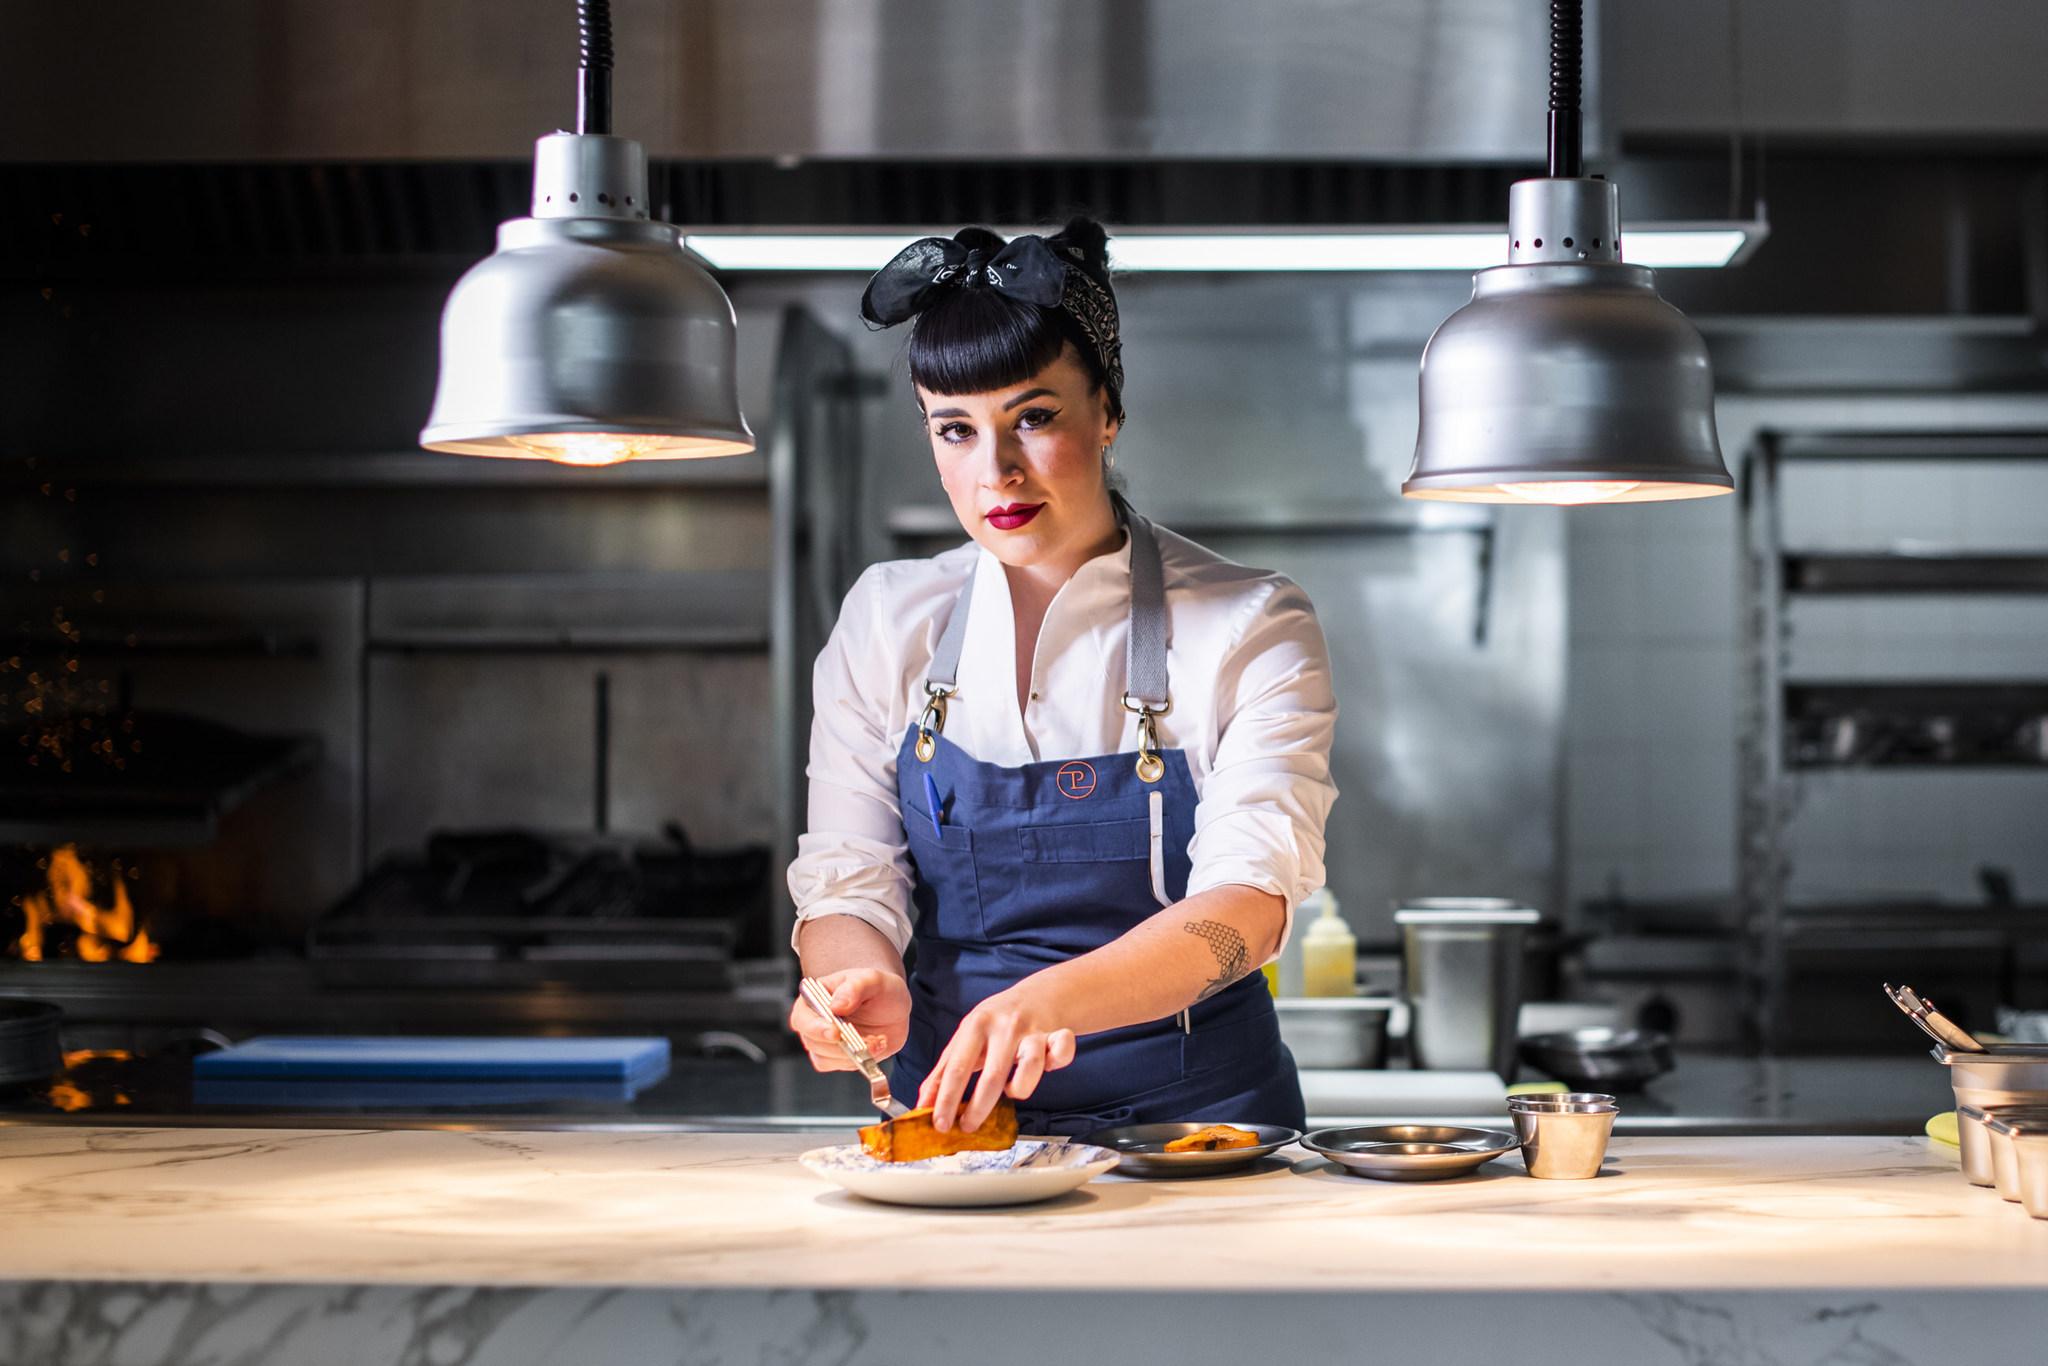 Sara Perales, Chef del restaurante Pedegrú